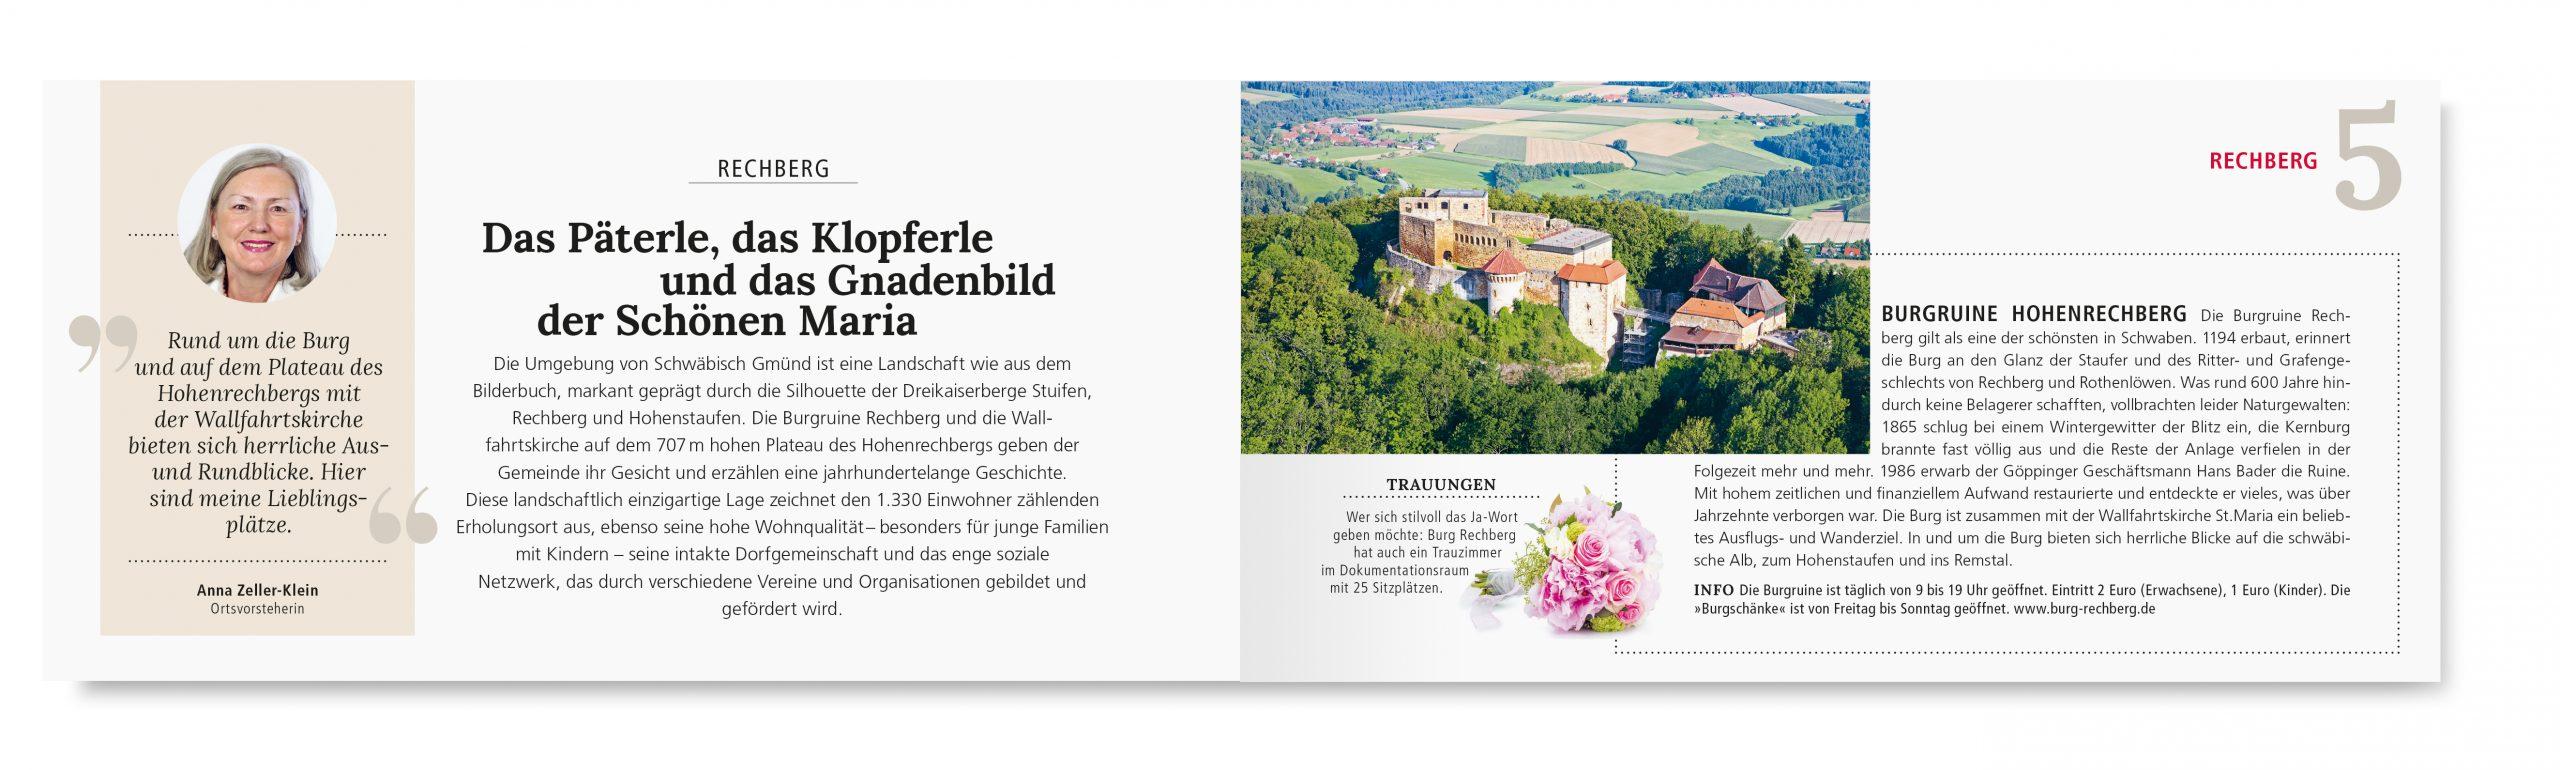 fh-web-broschuere-lieblingsorte-4-scaled.jpg